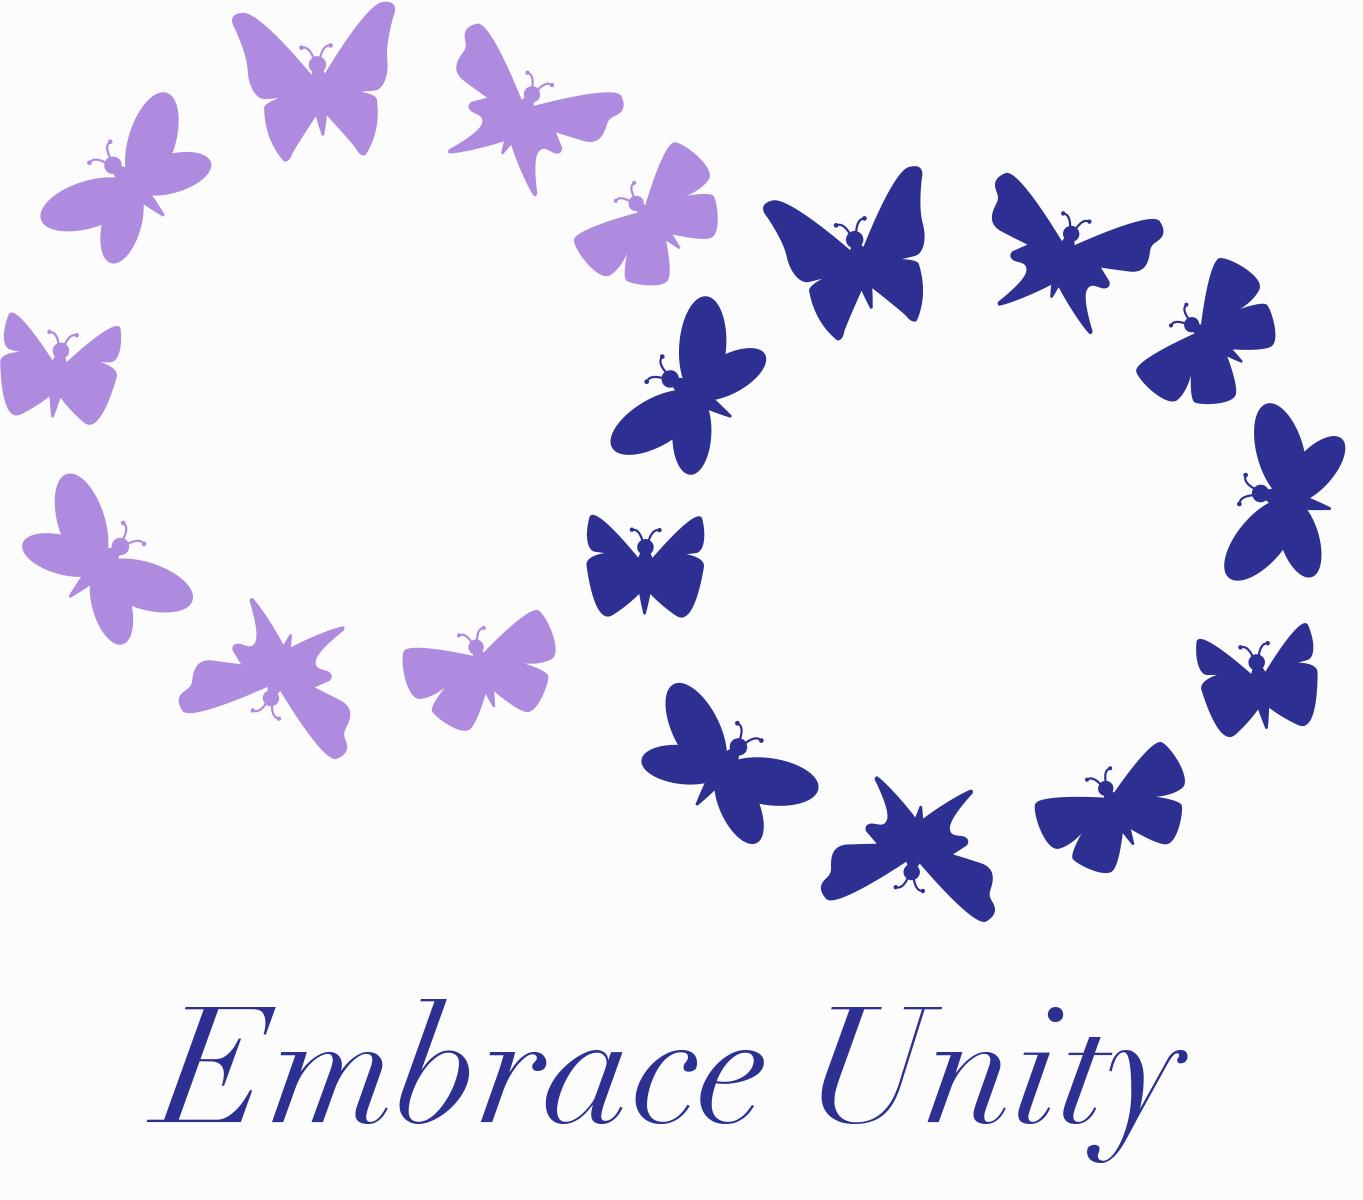 Embrace Unity logo.jpg